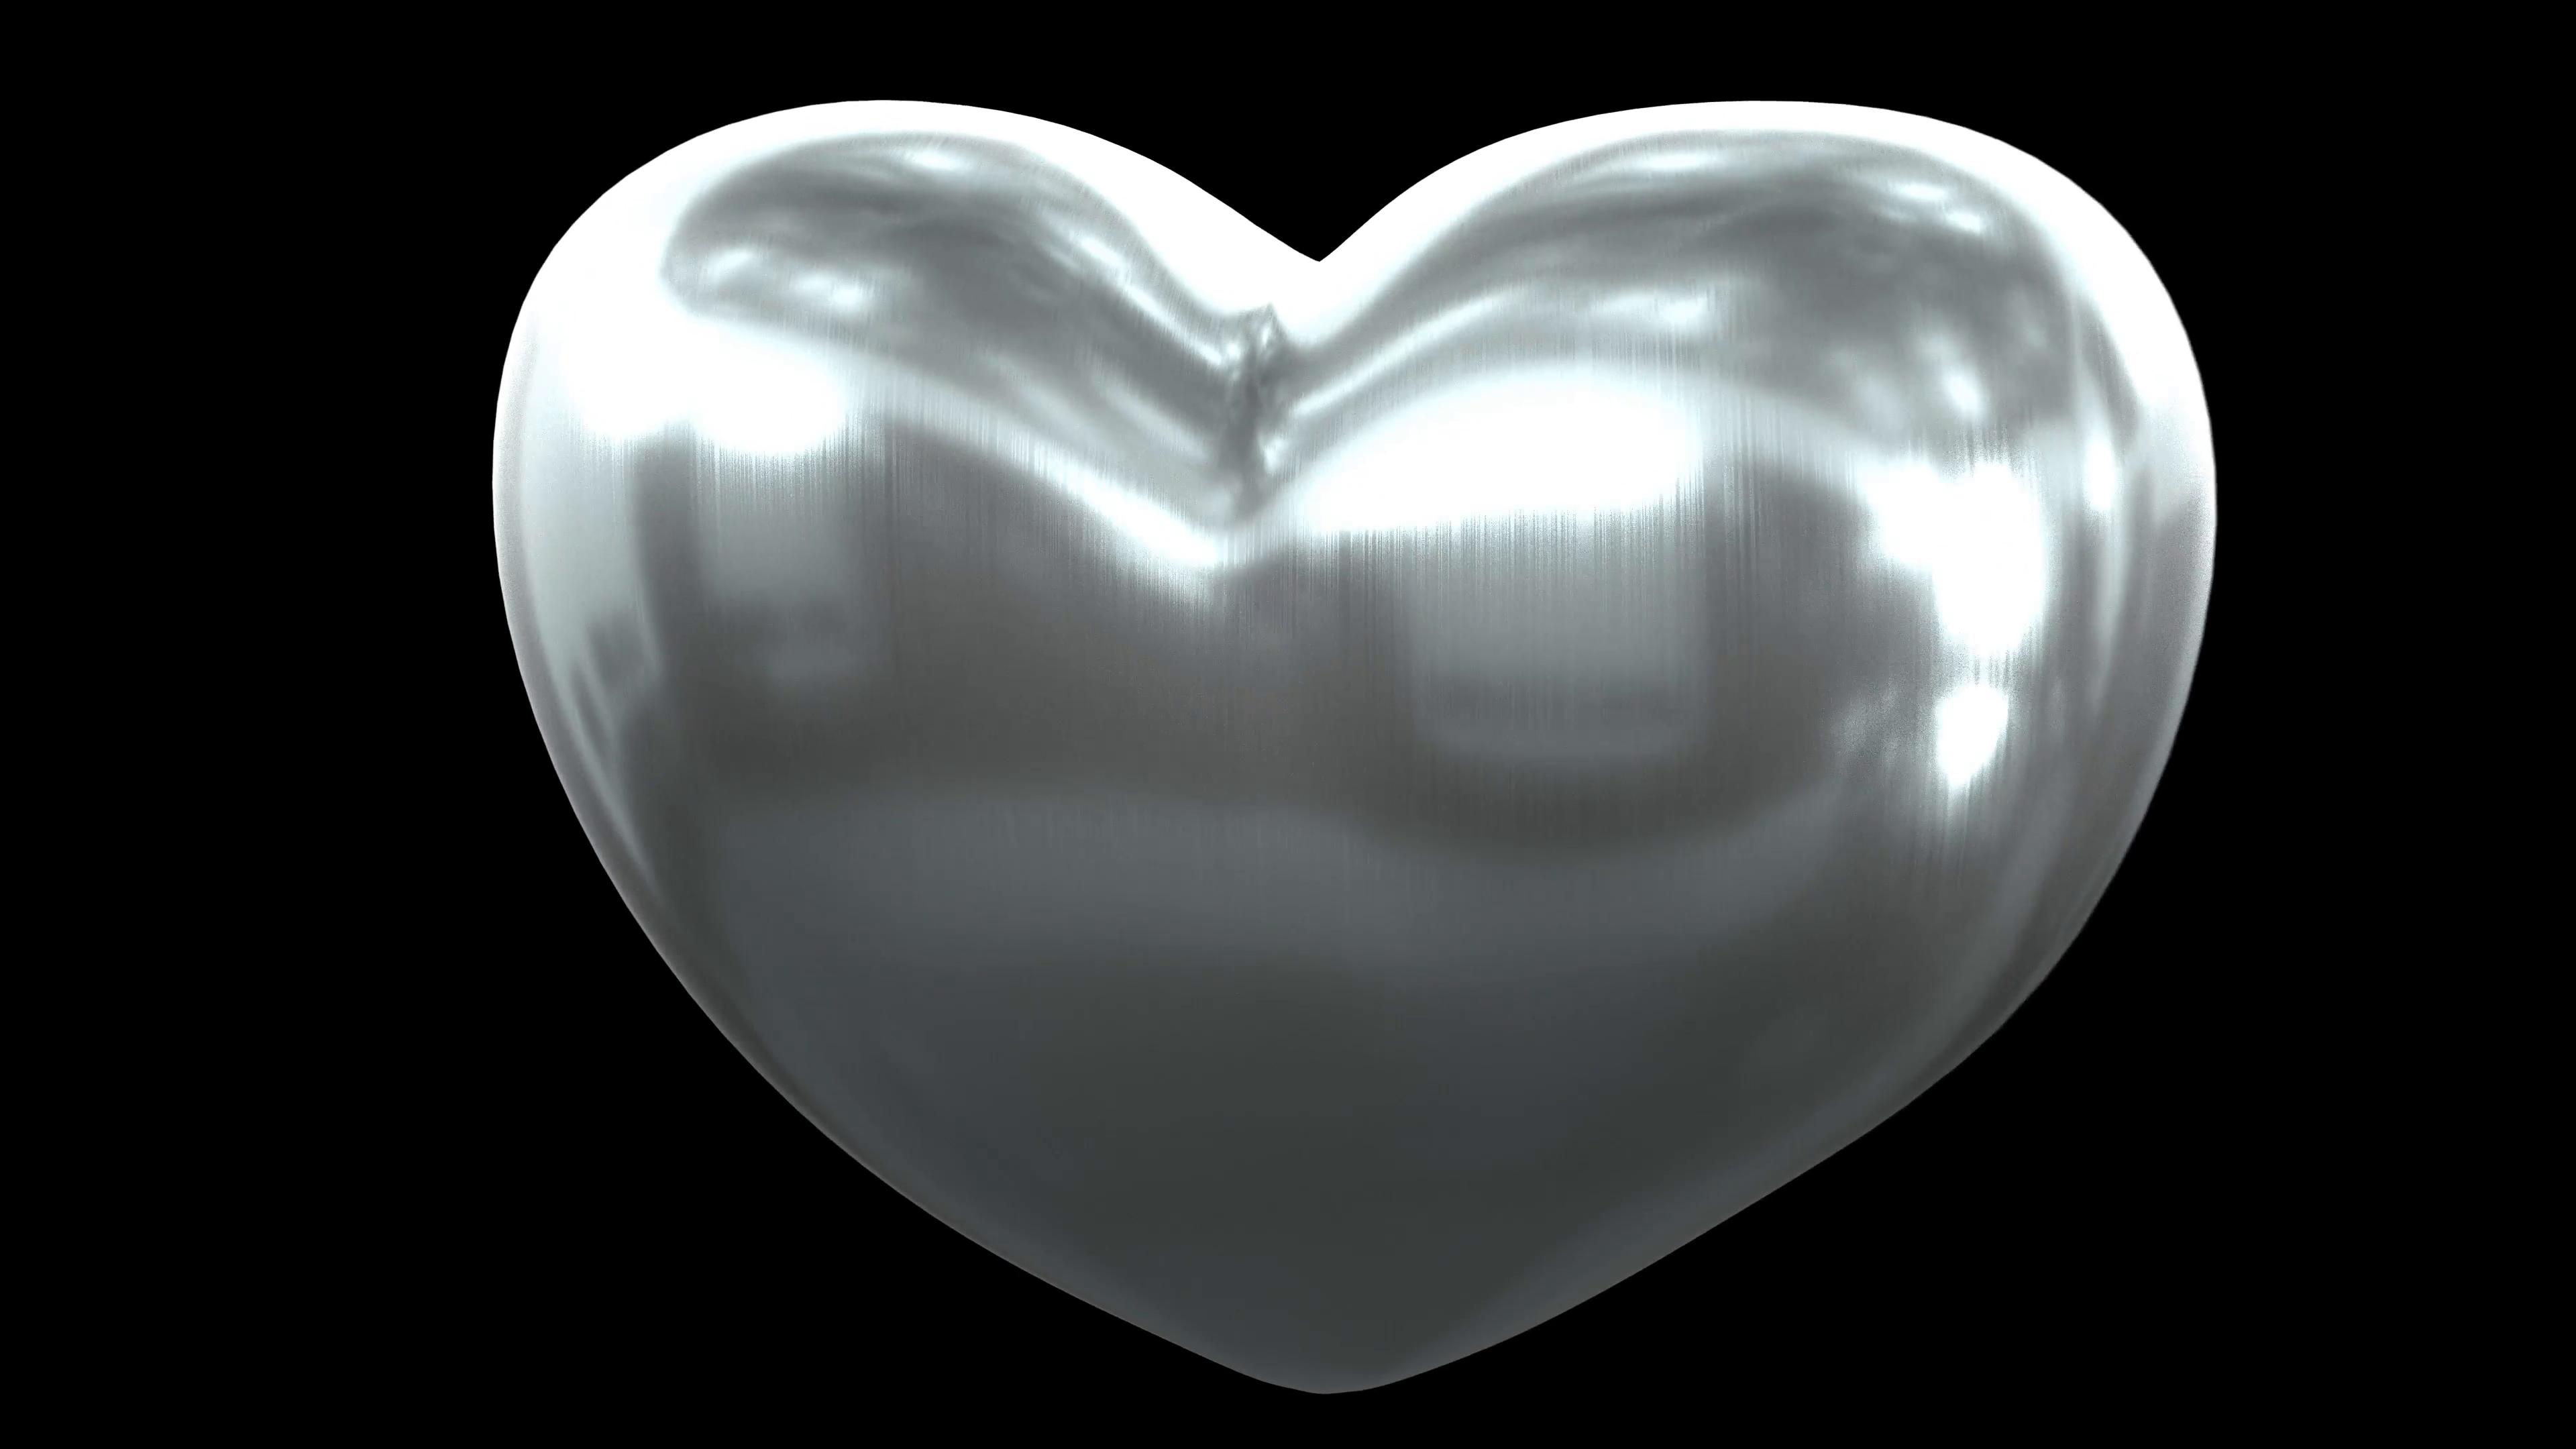 Love and Romance Heart Beat Motion Background - Videoblocks